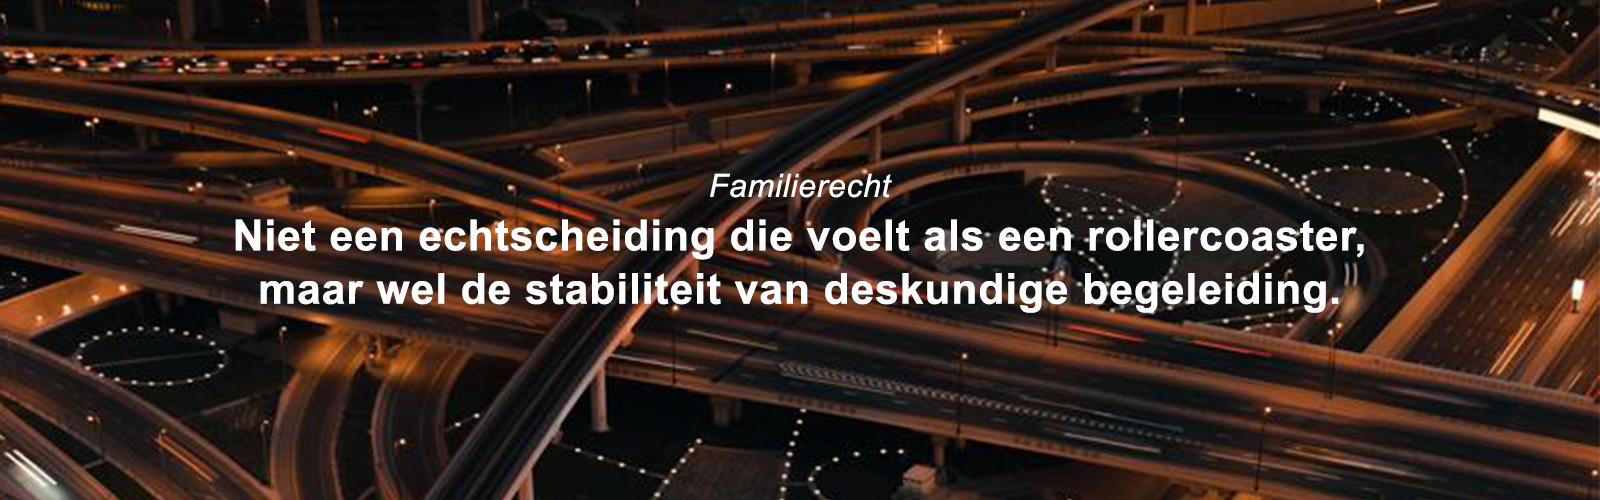 homepage-banner-familierecht_new